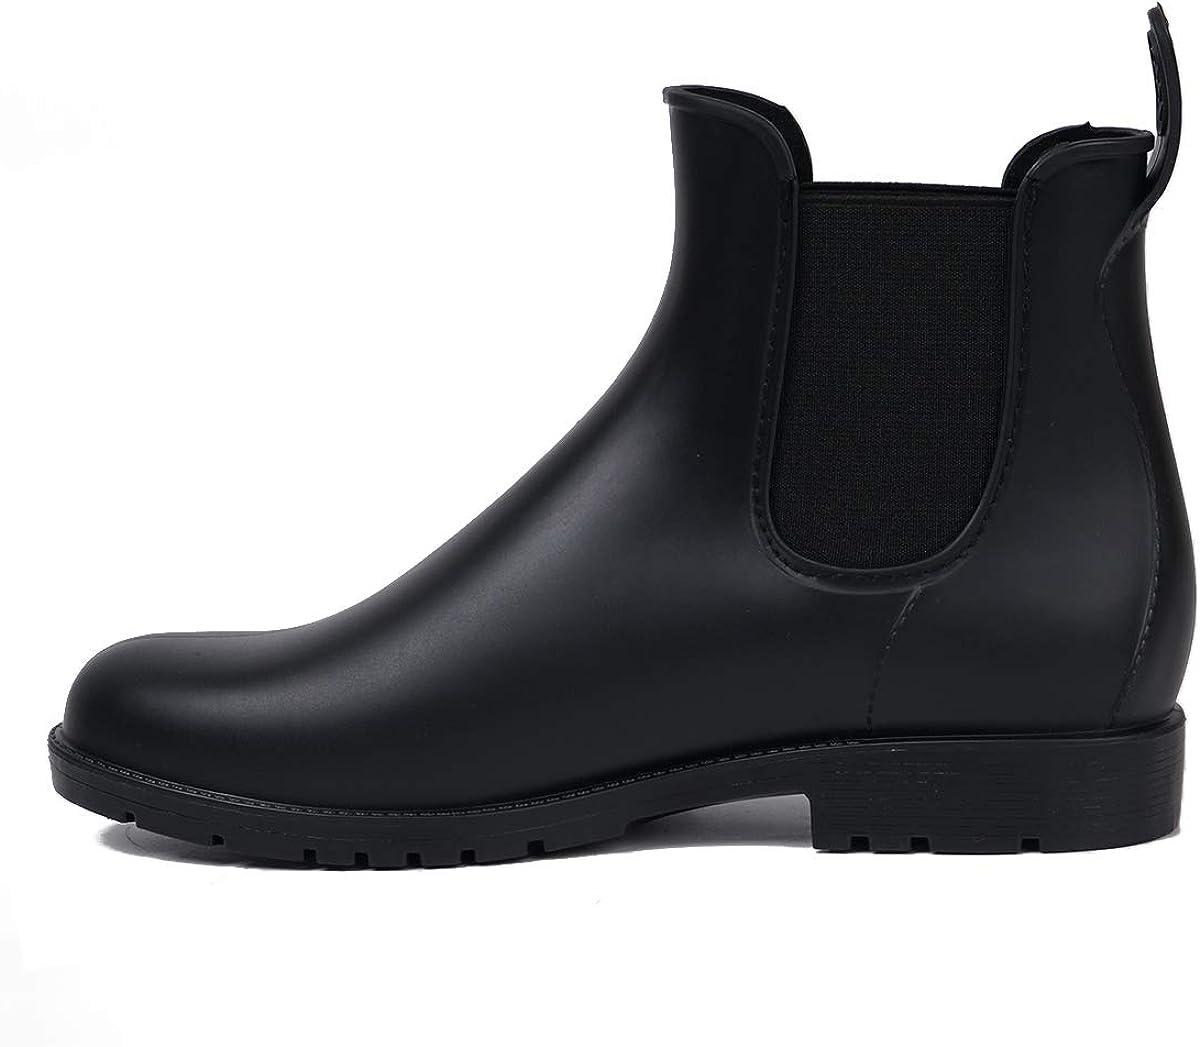 Safety and trust Women's Chelsea Genuine Rain Boots Waterproof siz Black Booties Ankle